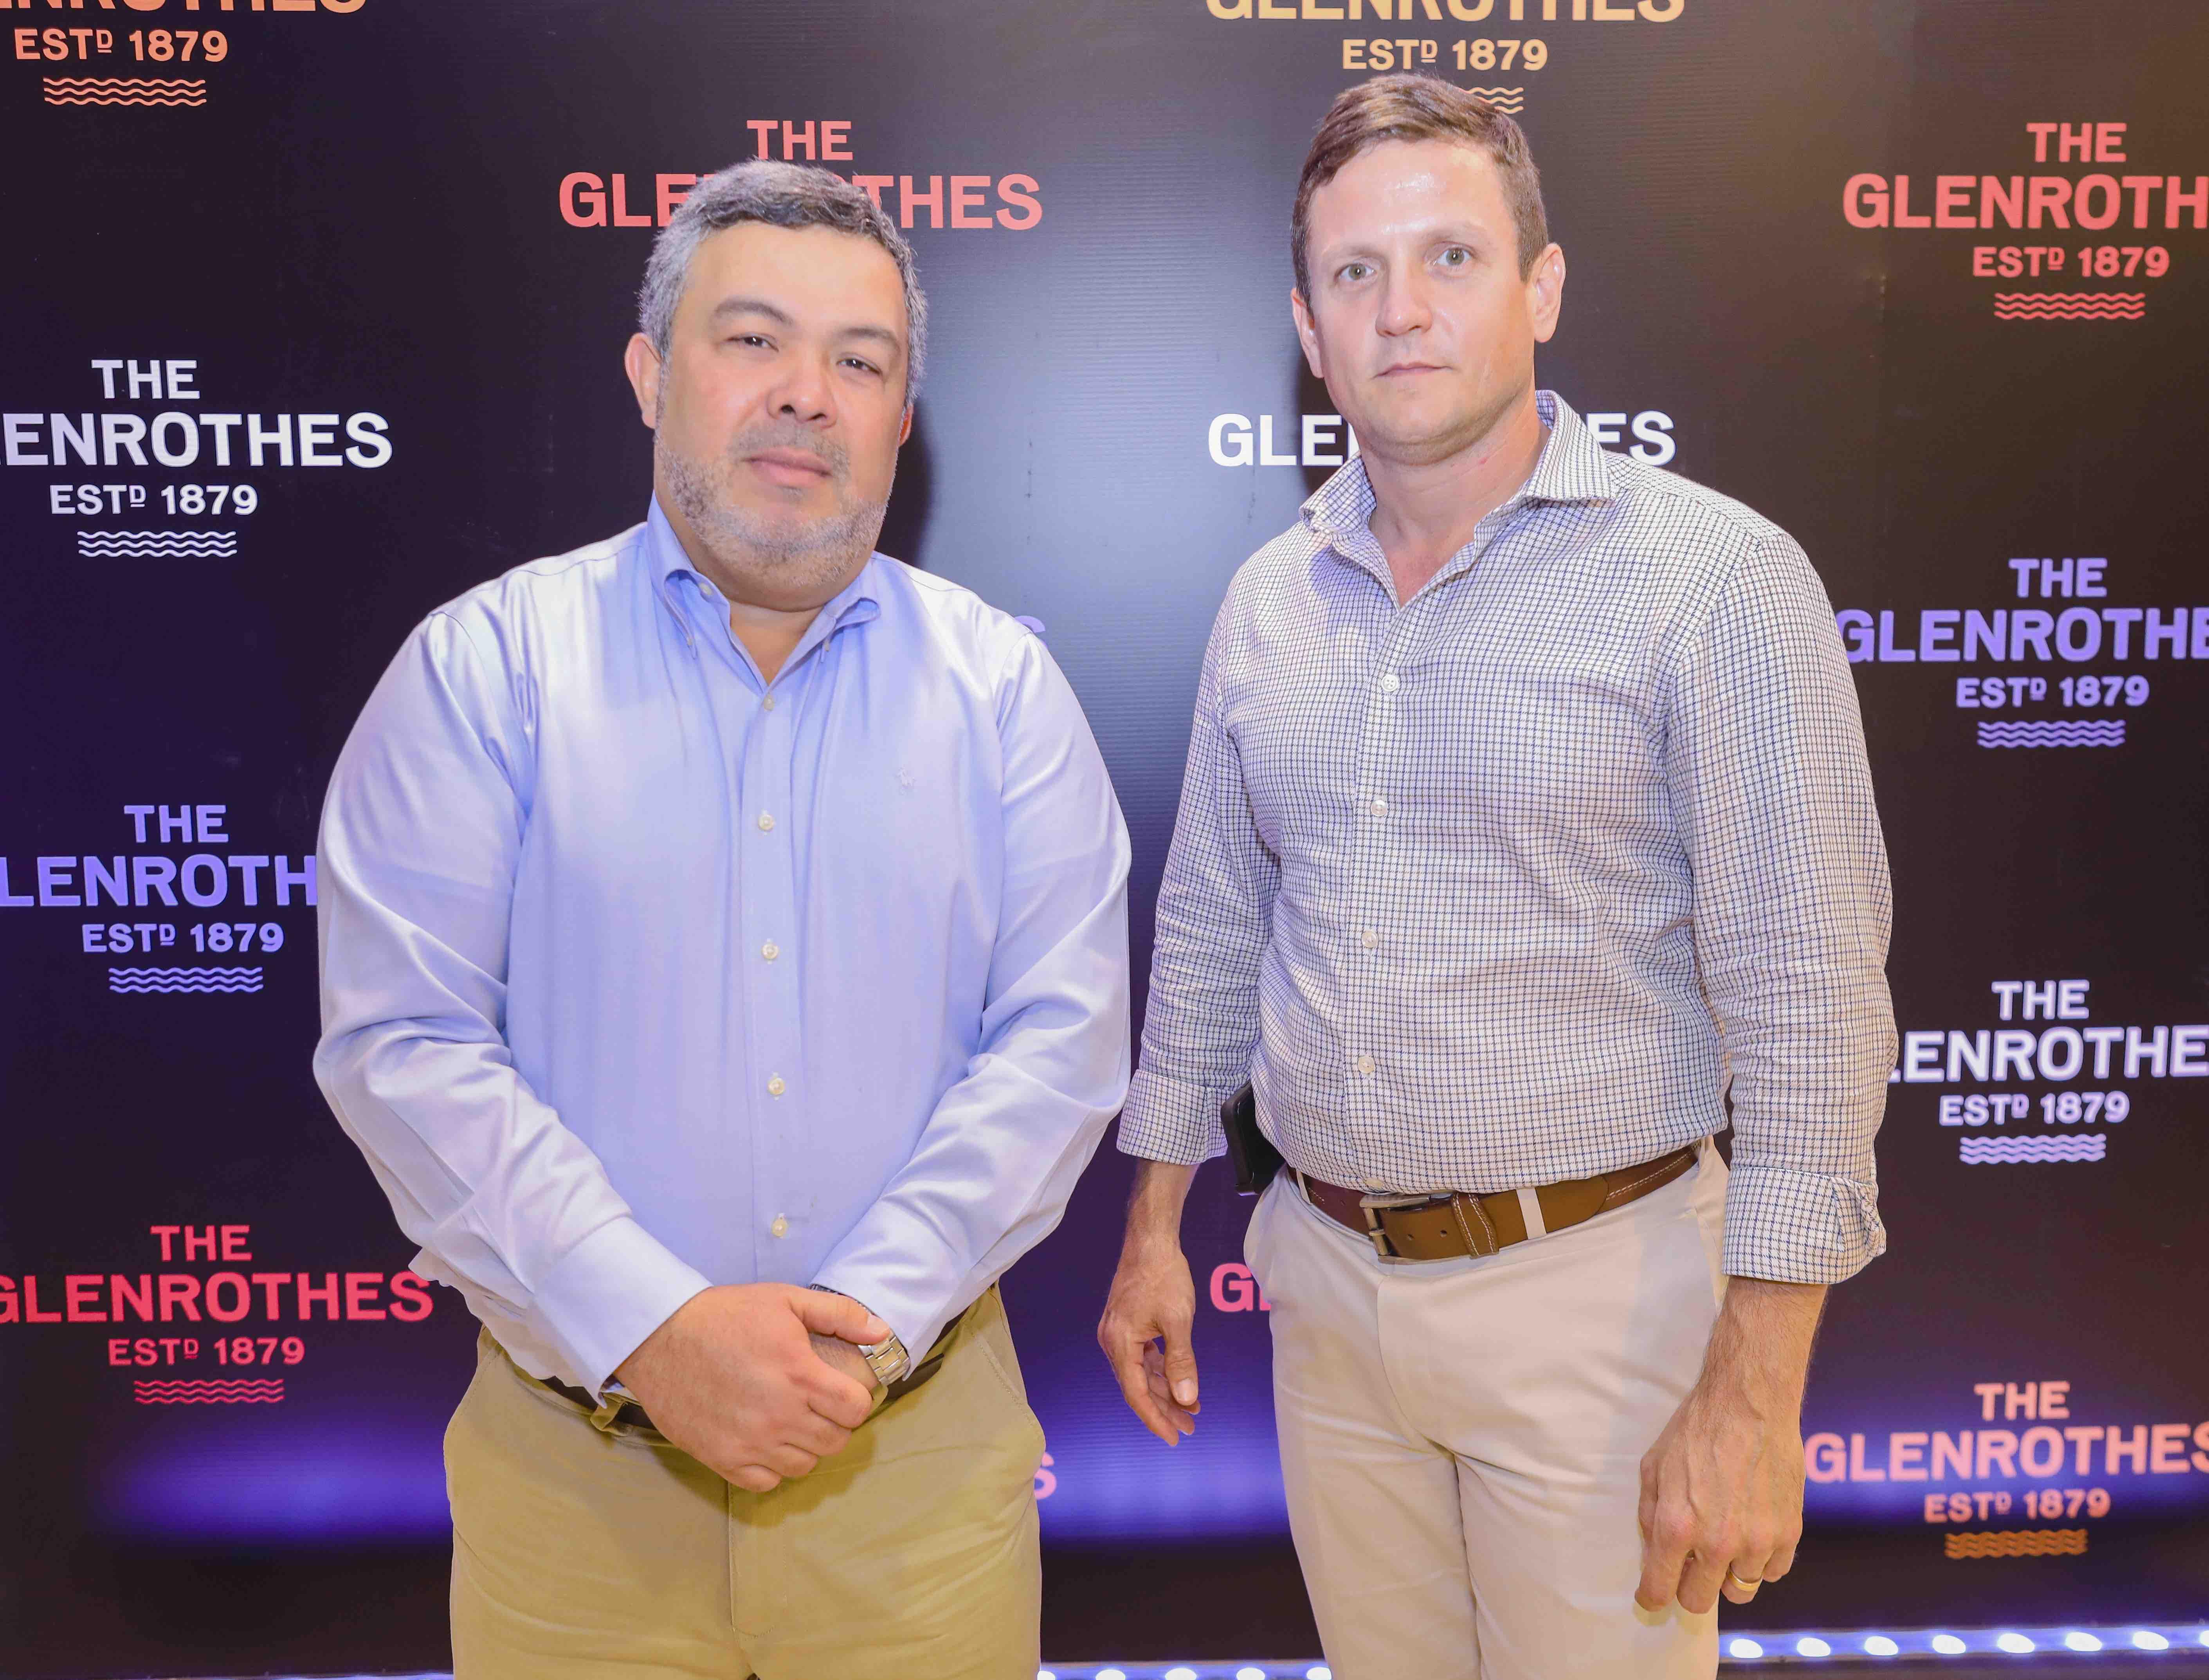 8. Luis González y Ricardo Salazar